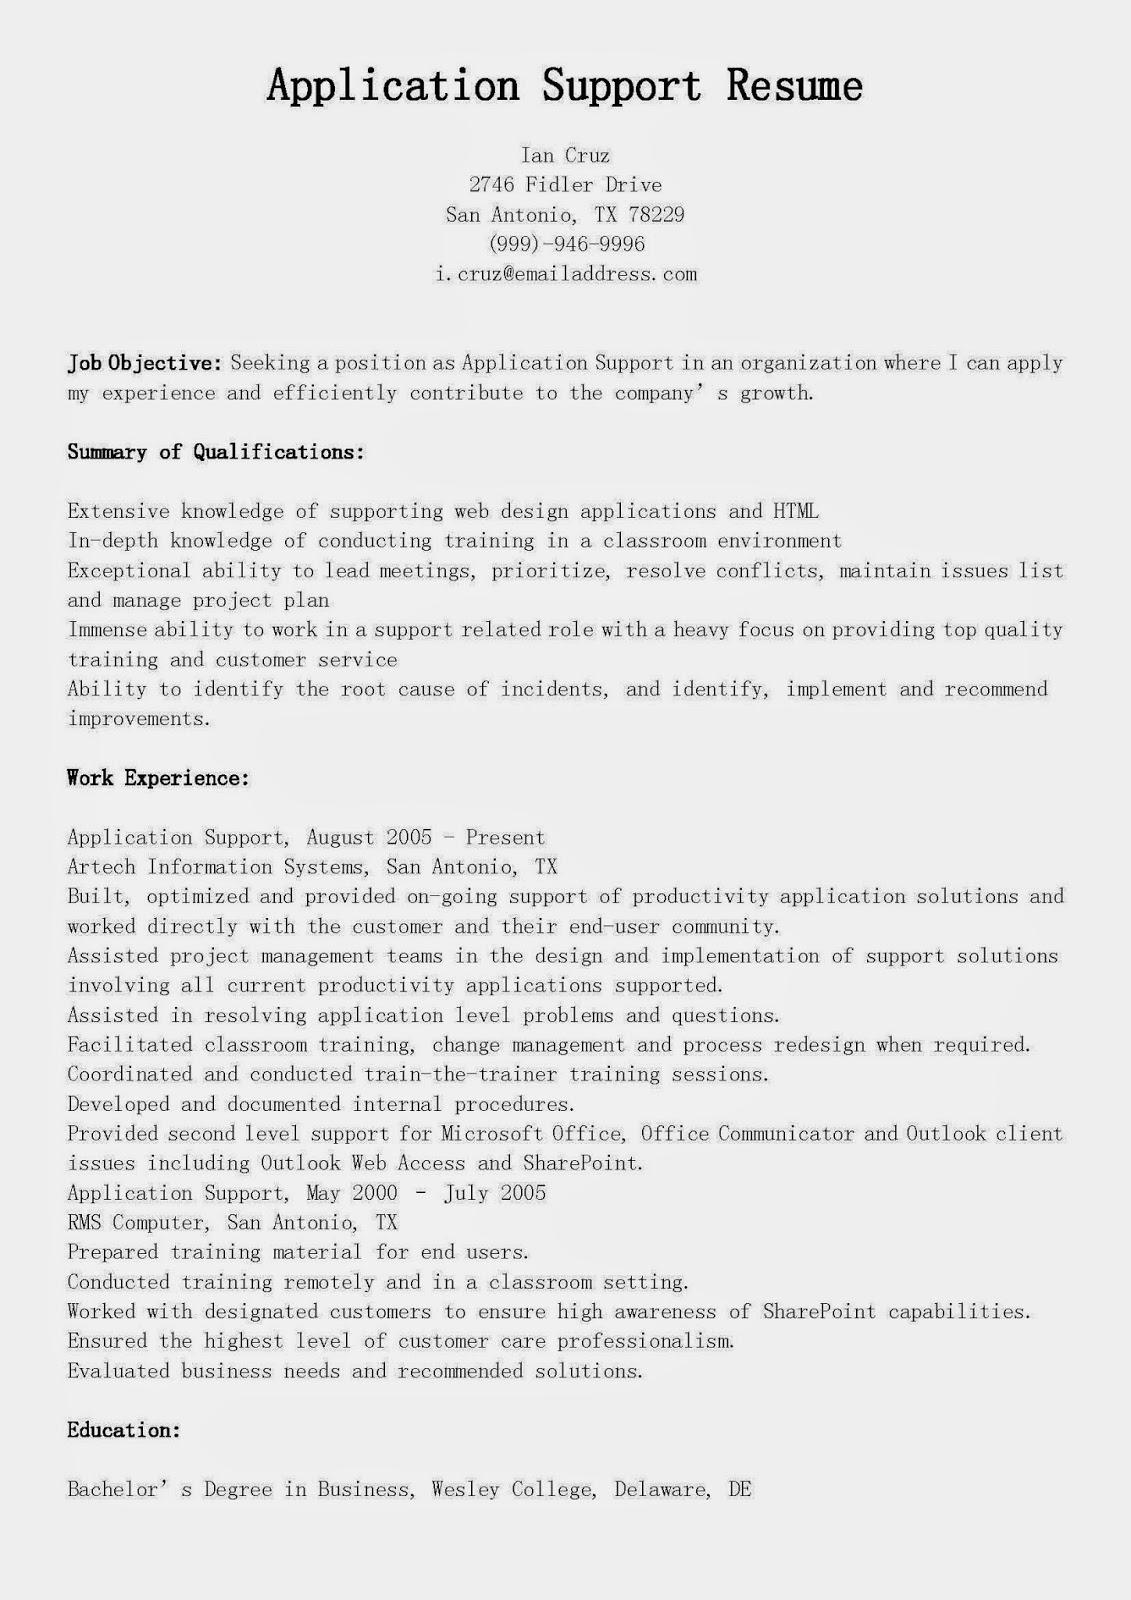 desktop support technician cover letter smlf service help ...